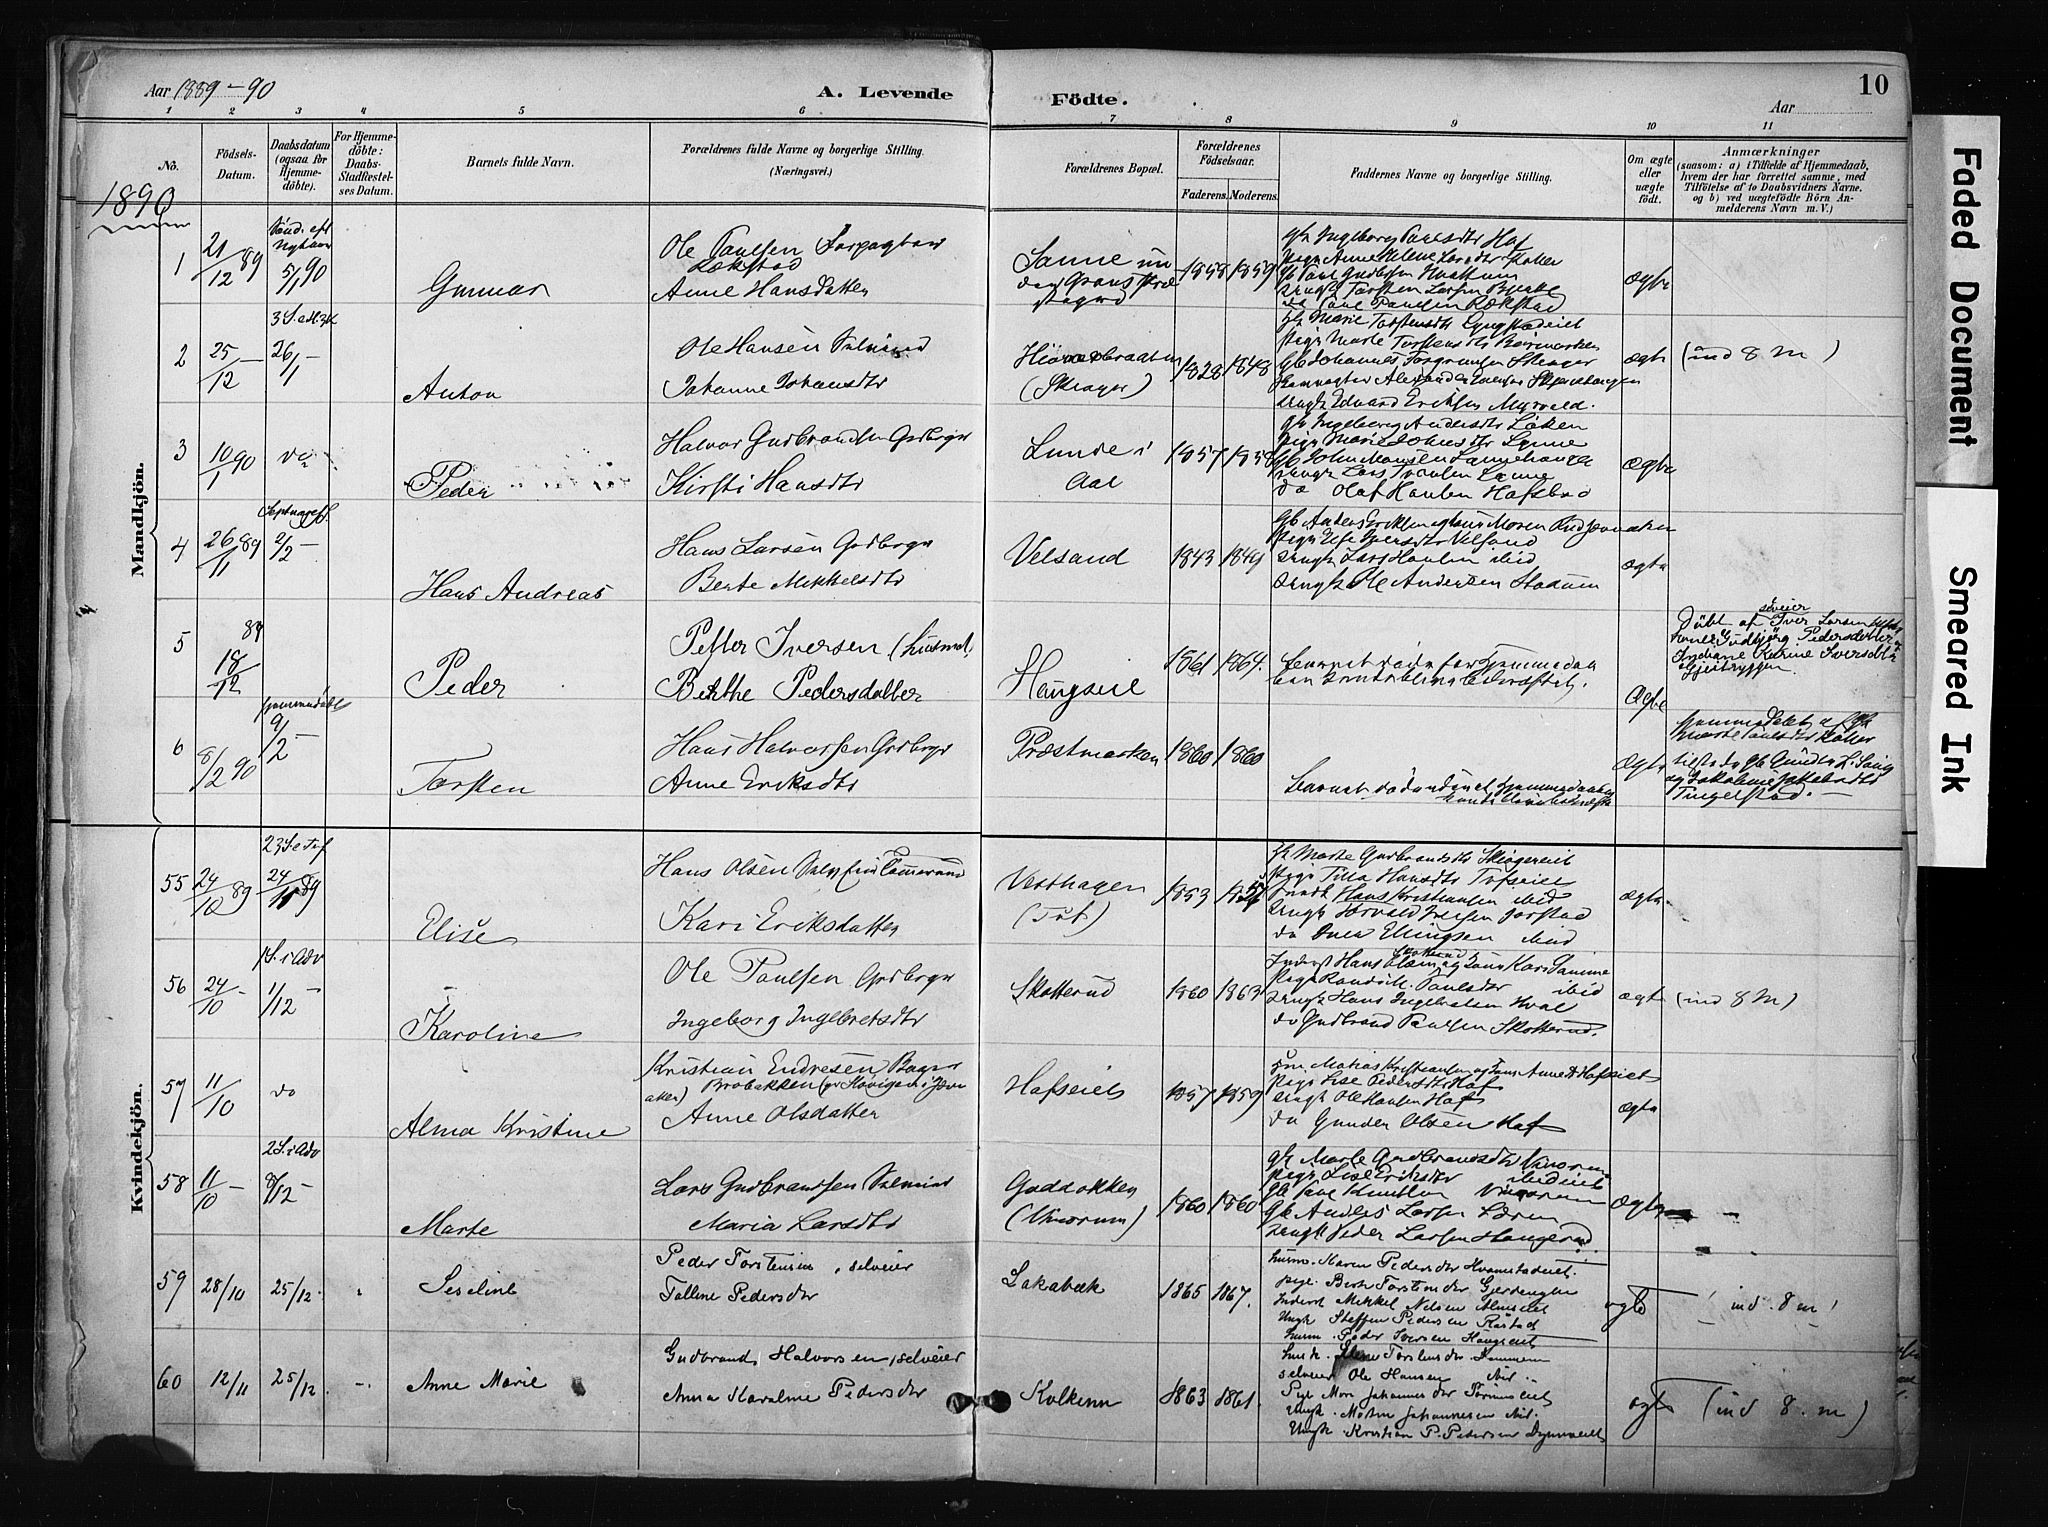 SAH, Gran prestekontor, Ministerialbok nr. 17, 1889-1897, s. 10